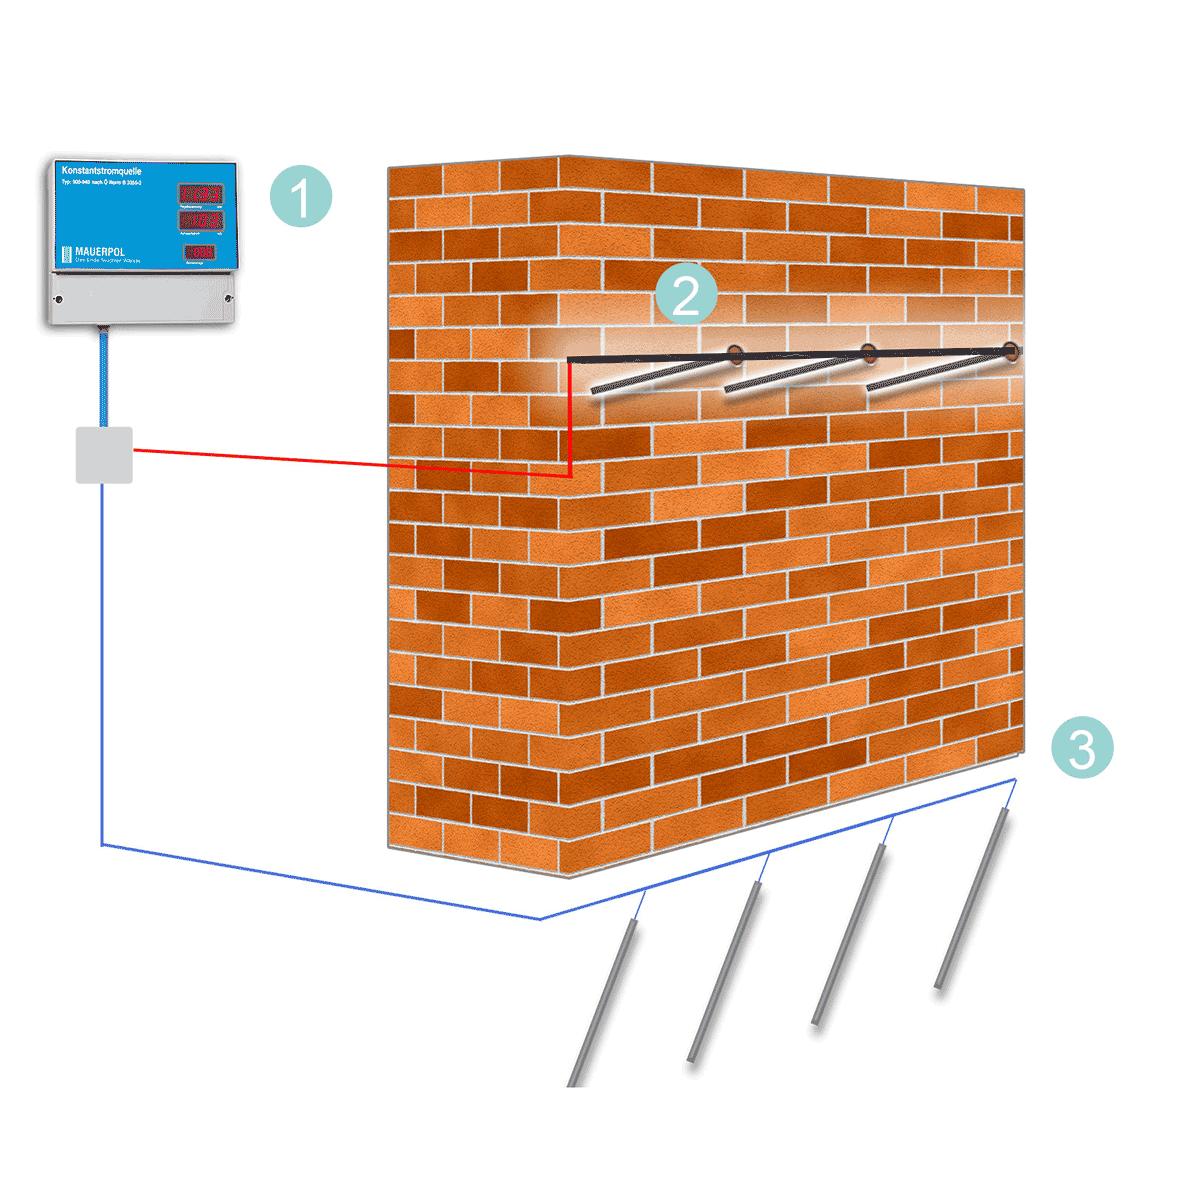 Gut gemocht Mauertrocknung durch aktive Elektroosmose | Mauertrockenlegung HI69